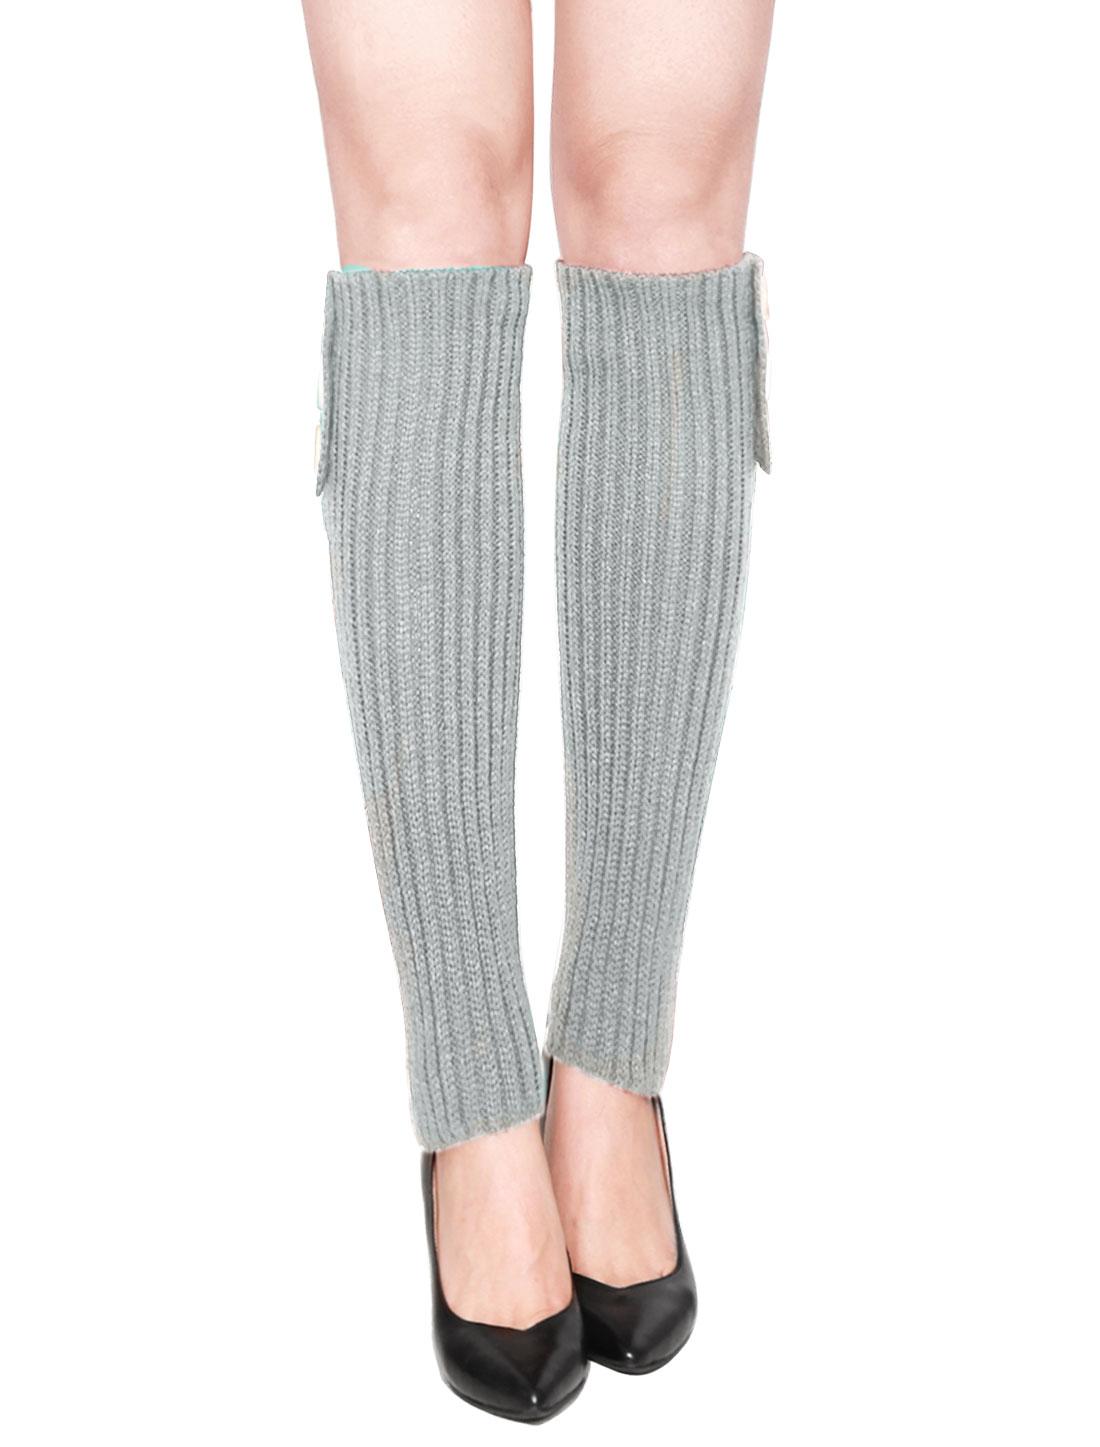 Women Three Buttons Decor Ribbed Knit Knee High Leg Warmers Pair Light Gray